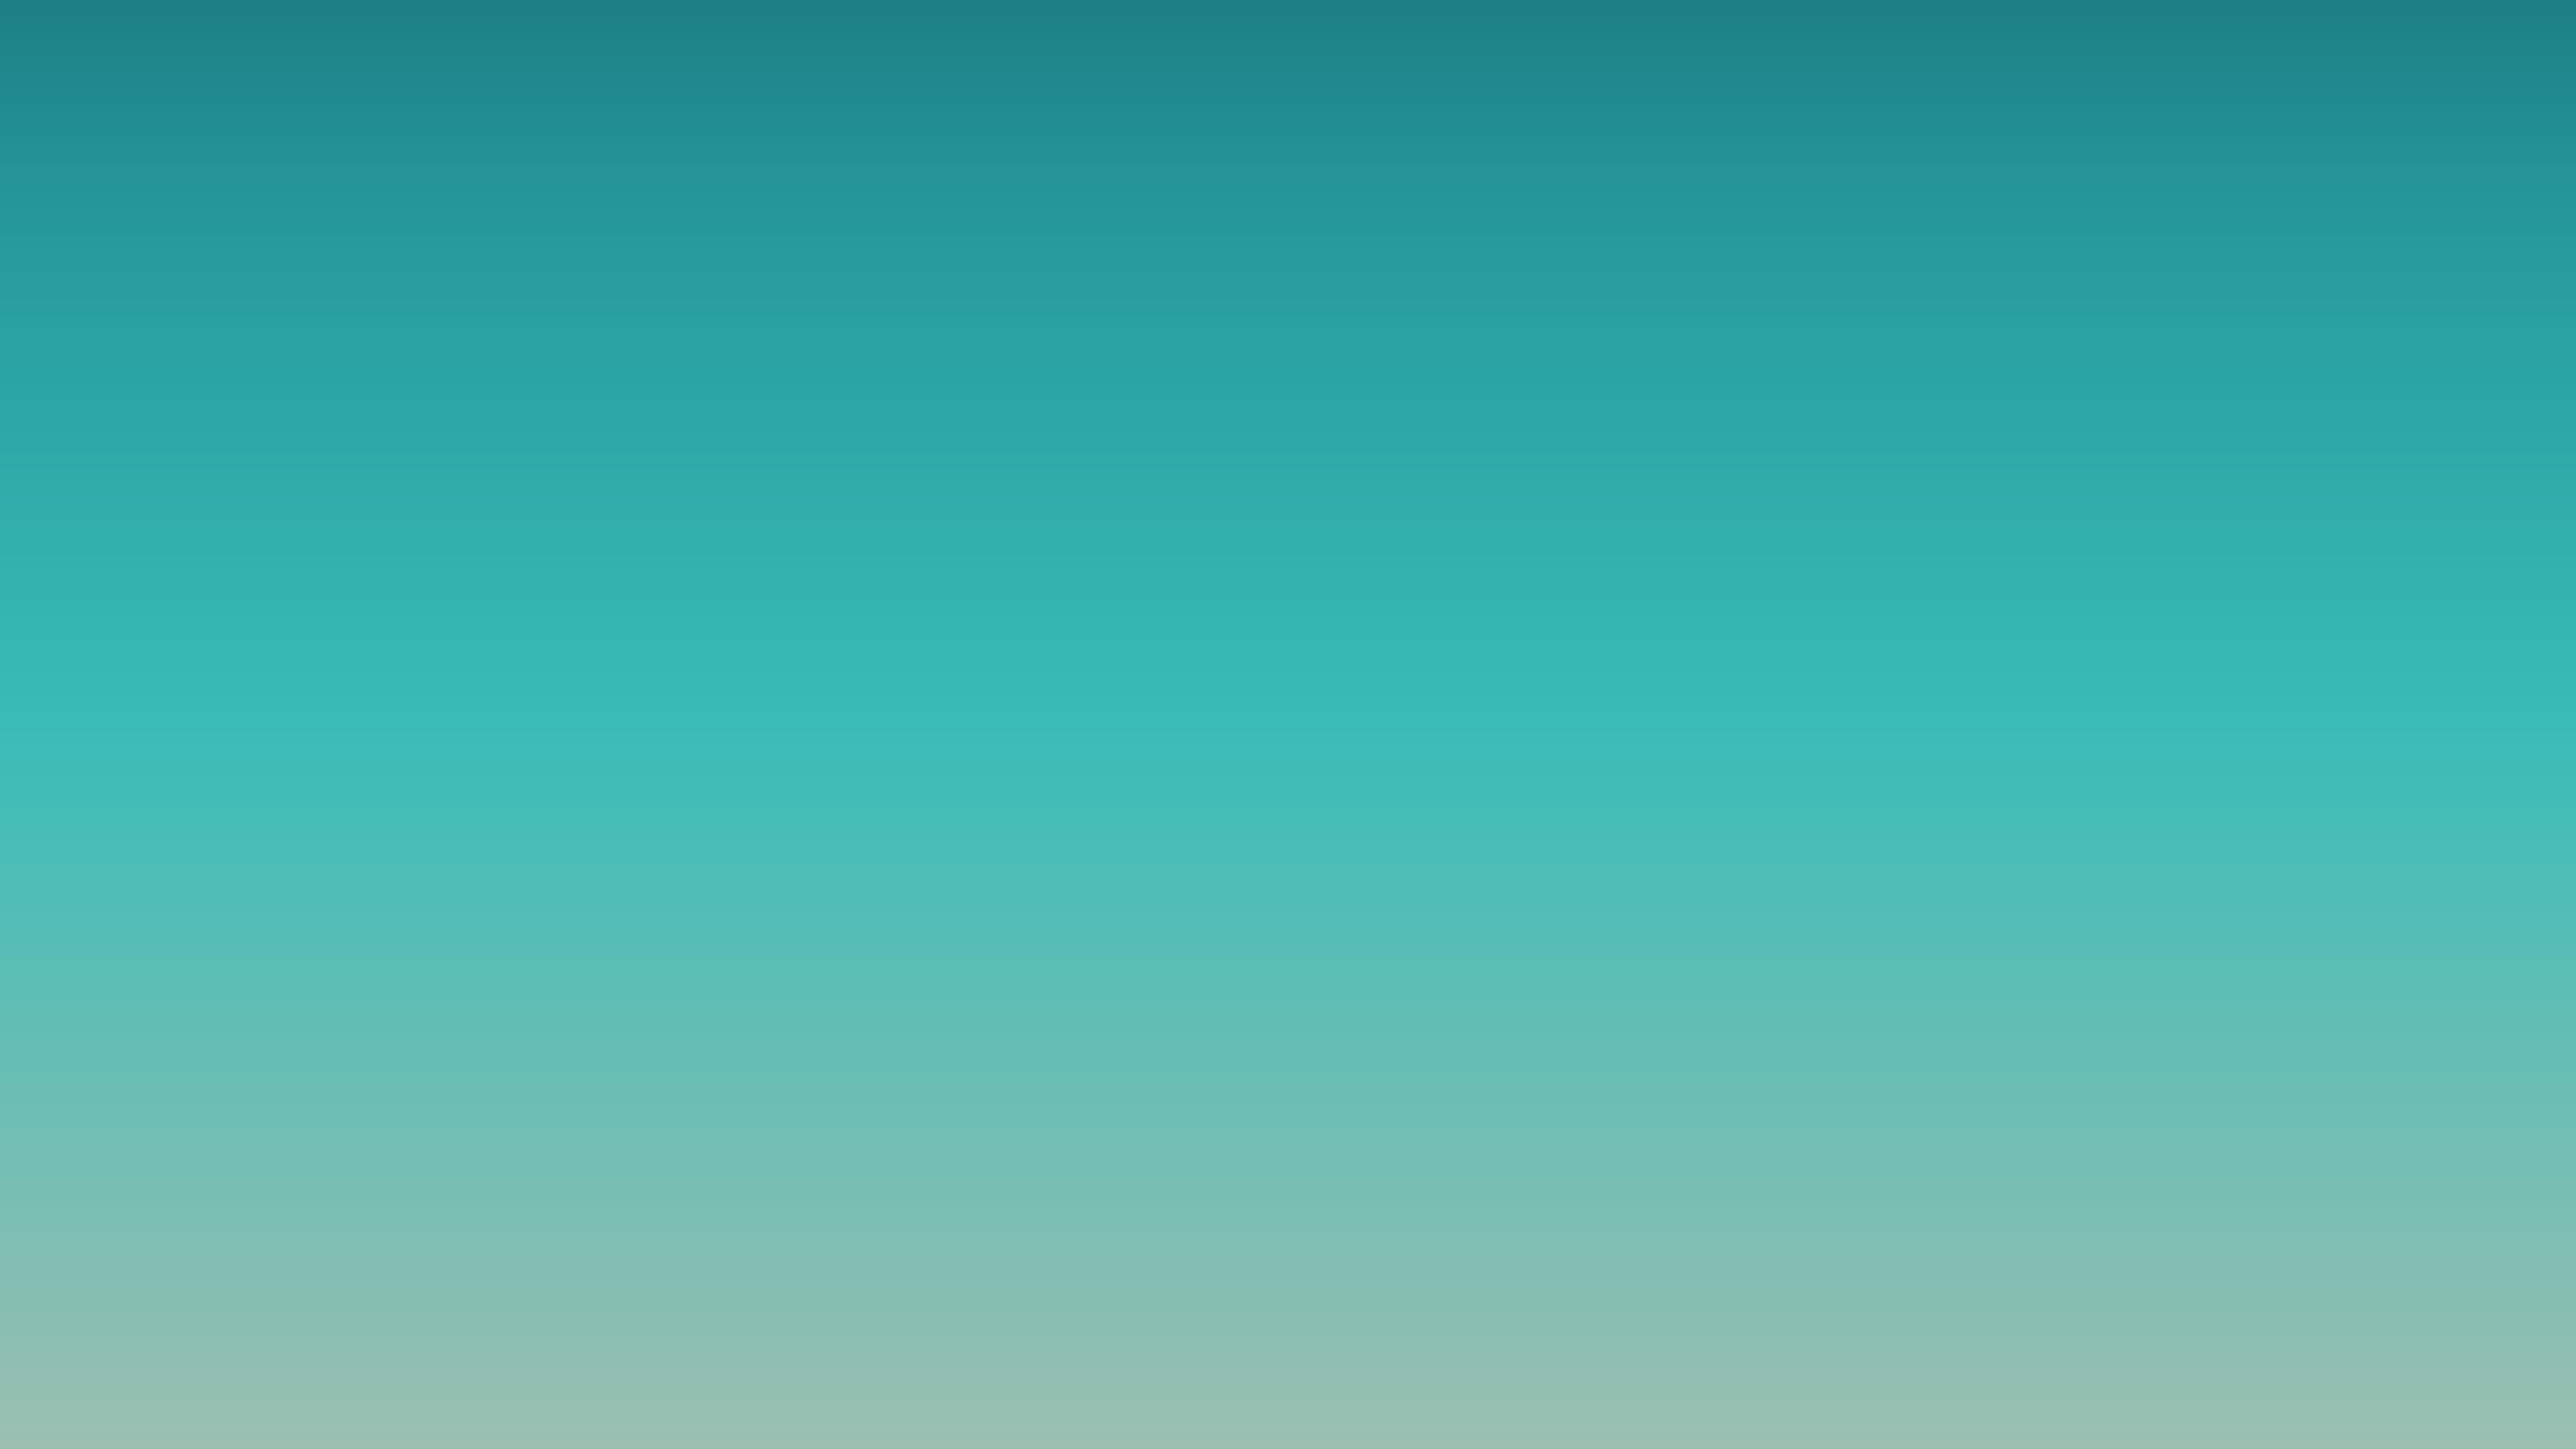 Fall Desktop Wallpaper Fall Cute Sl25 Iphone8 Ios11 Blue Background Apple Blur Gradation